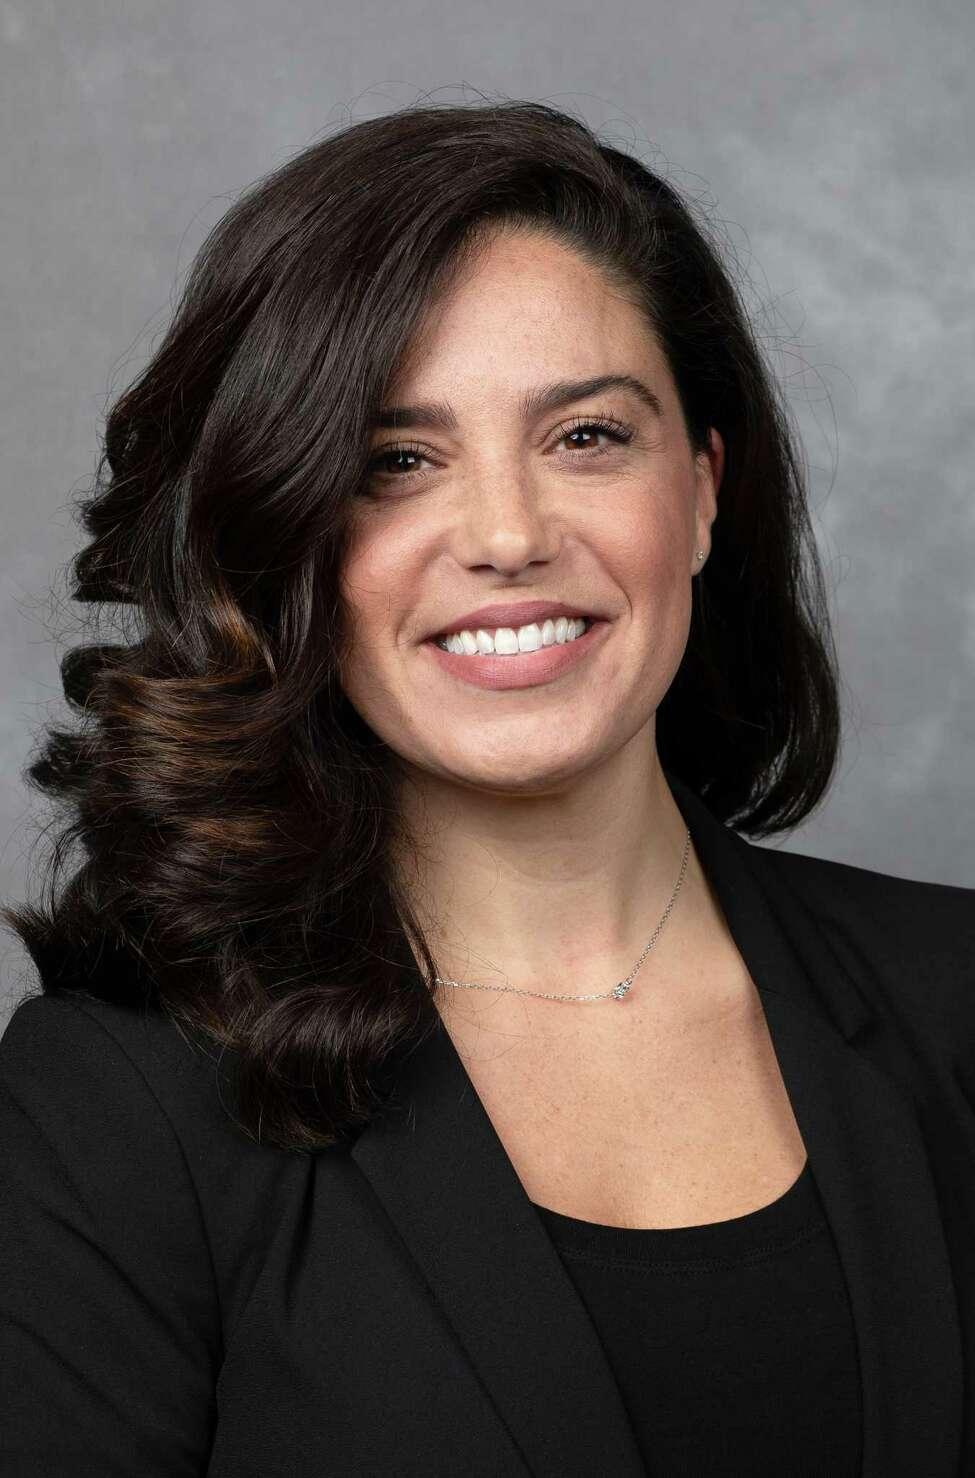 Renee LiBritz (Provided)